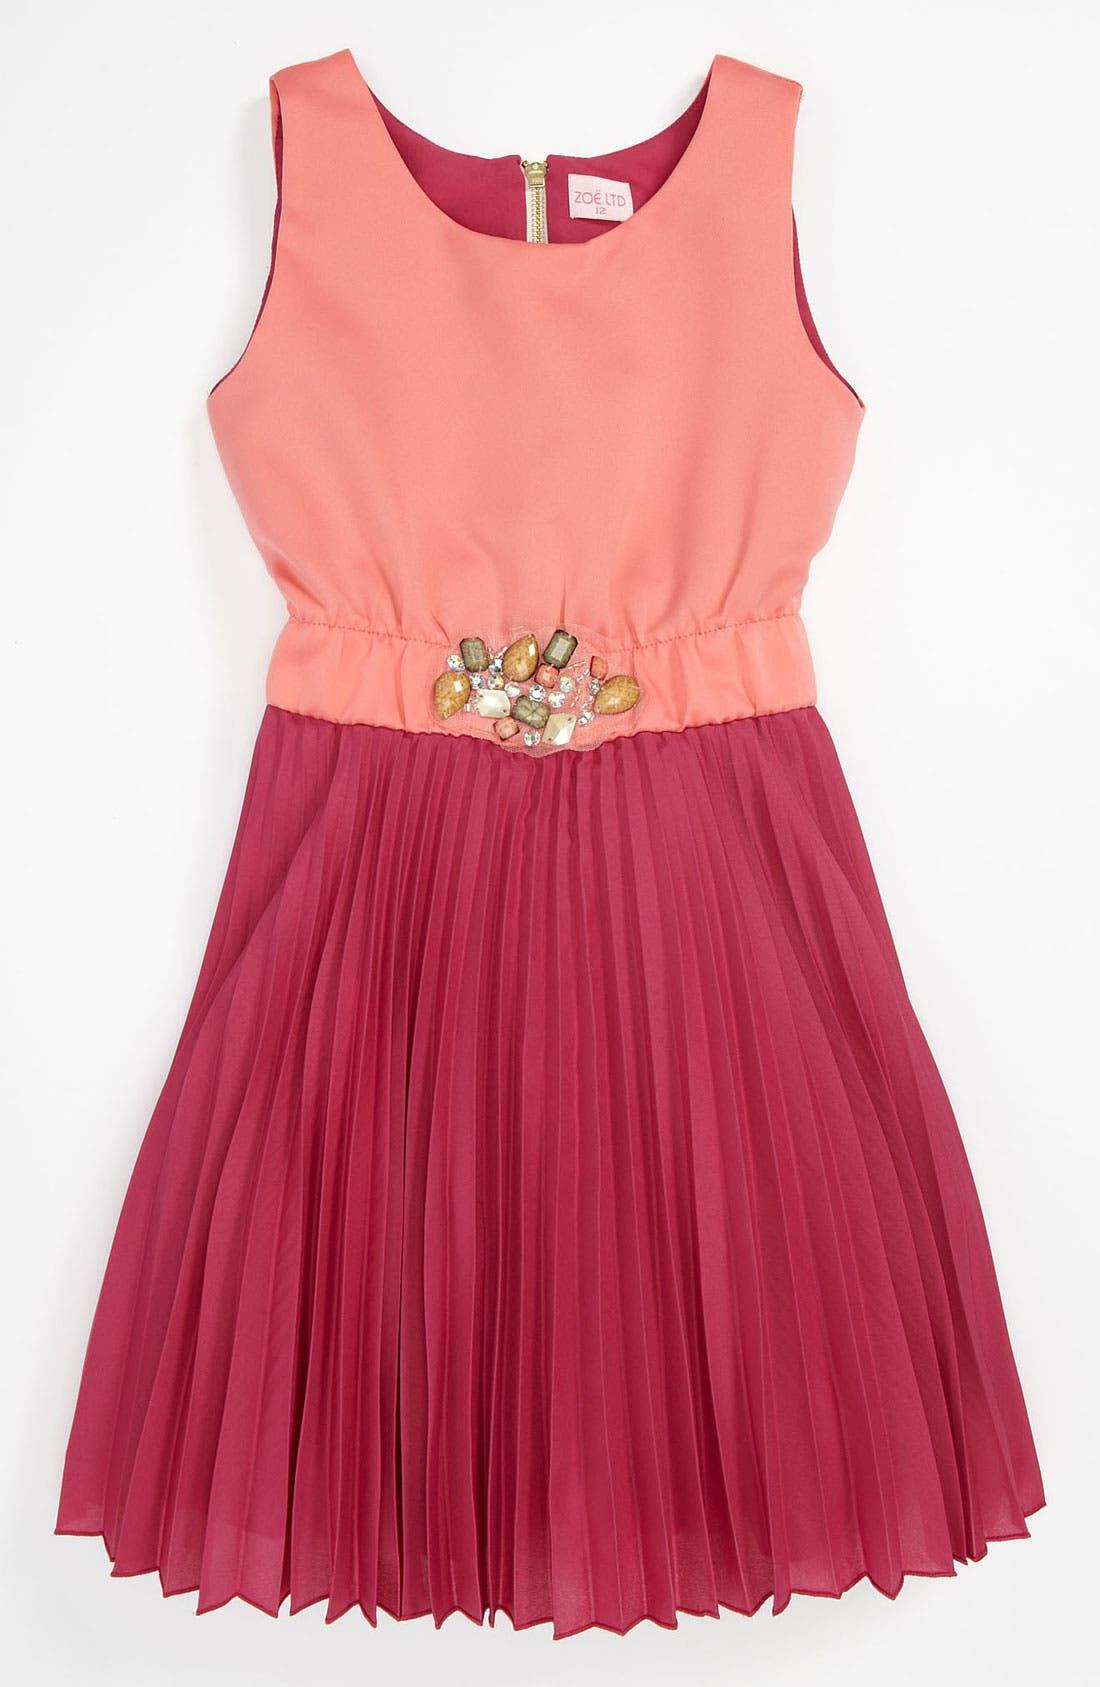 Main Image - Zoe Pleat Dress (Big Girls)